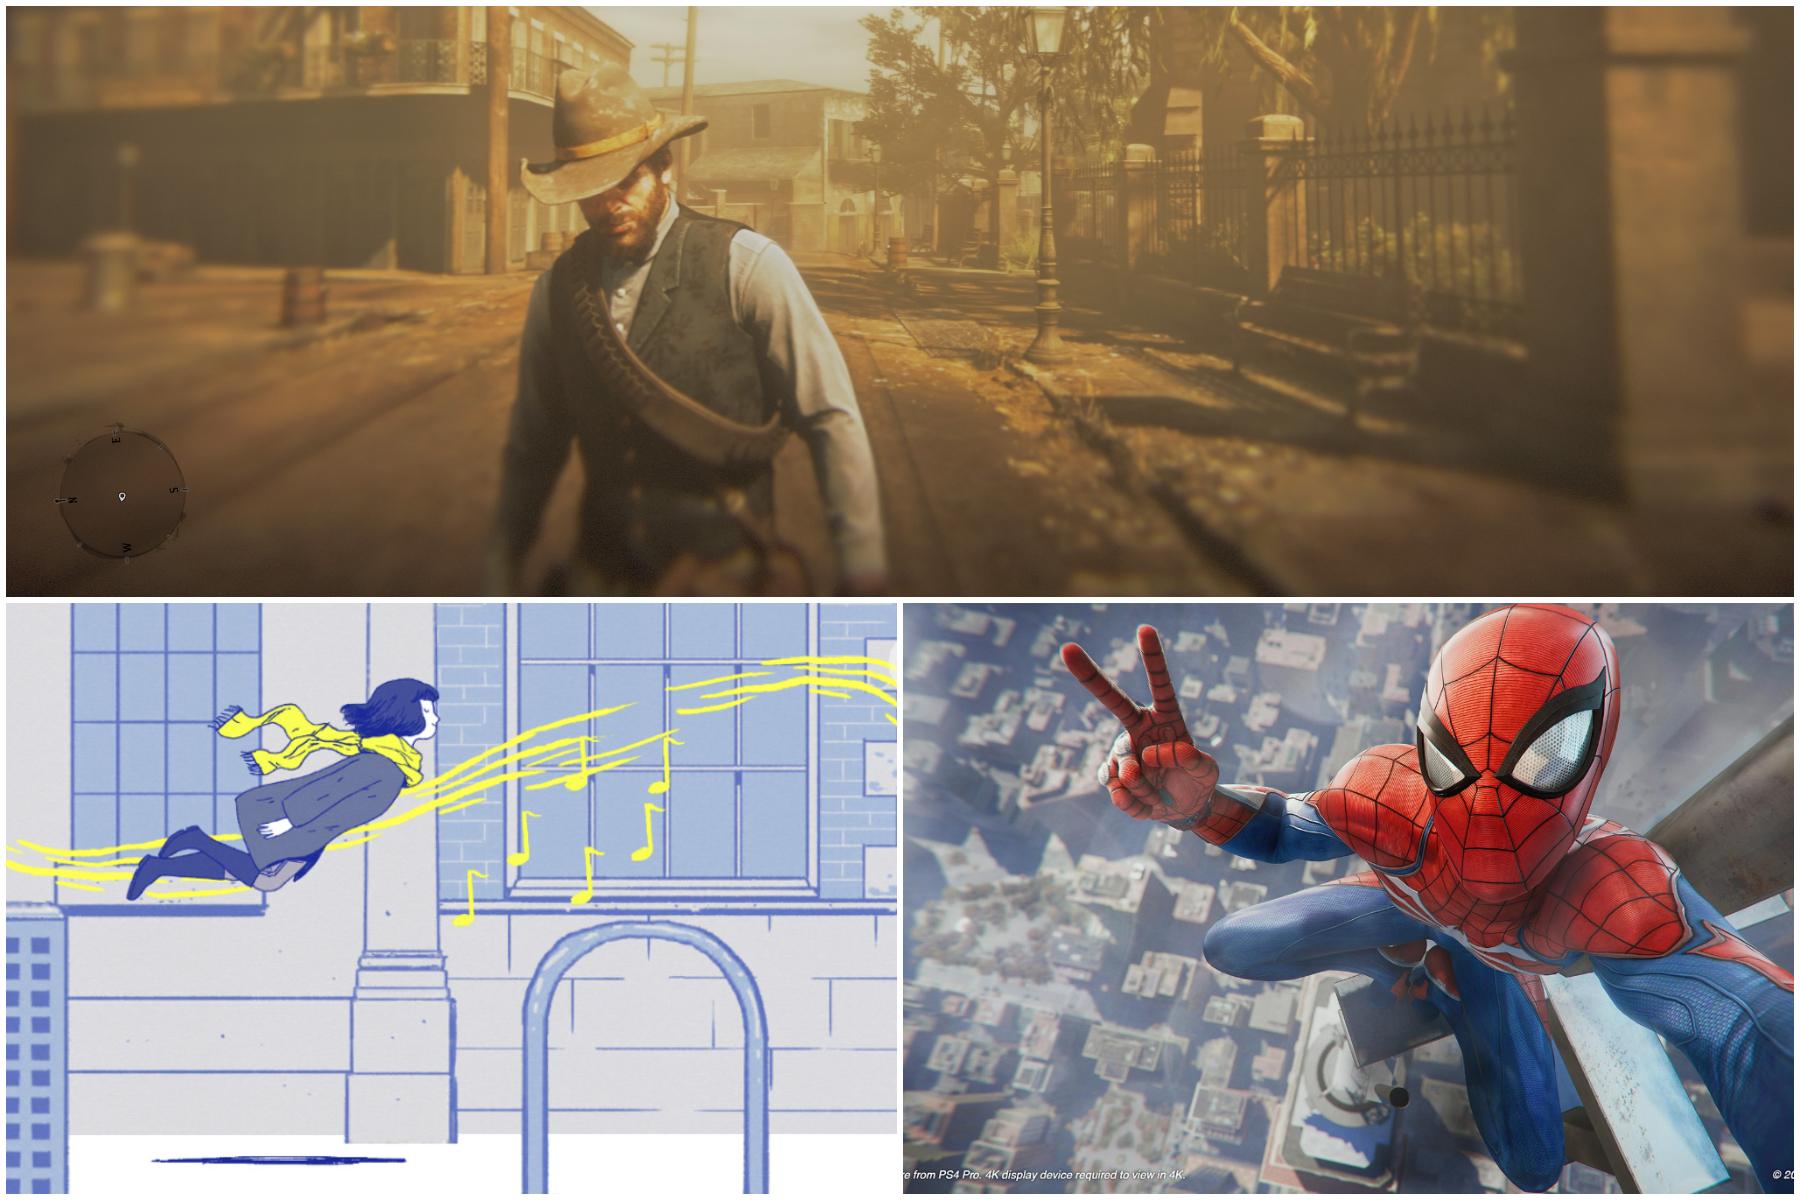 washingtonpost.com - Christopher Byrd, Harold Goldberg - The 10 best video games of 2018